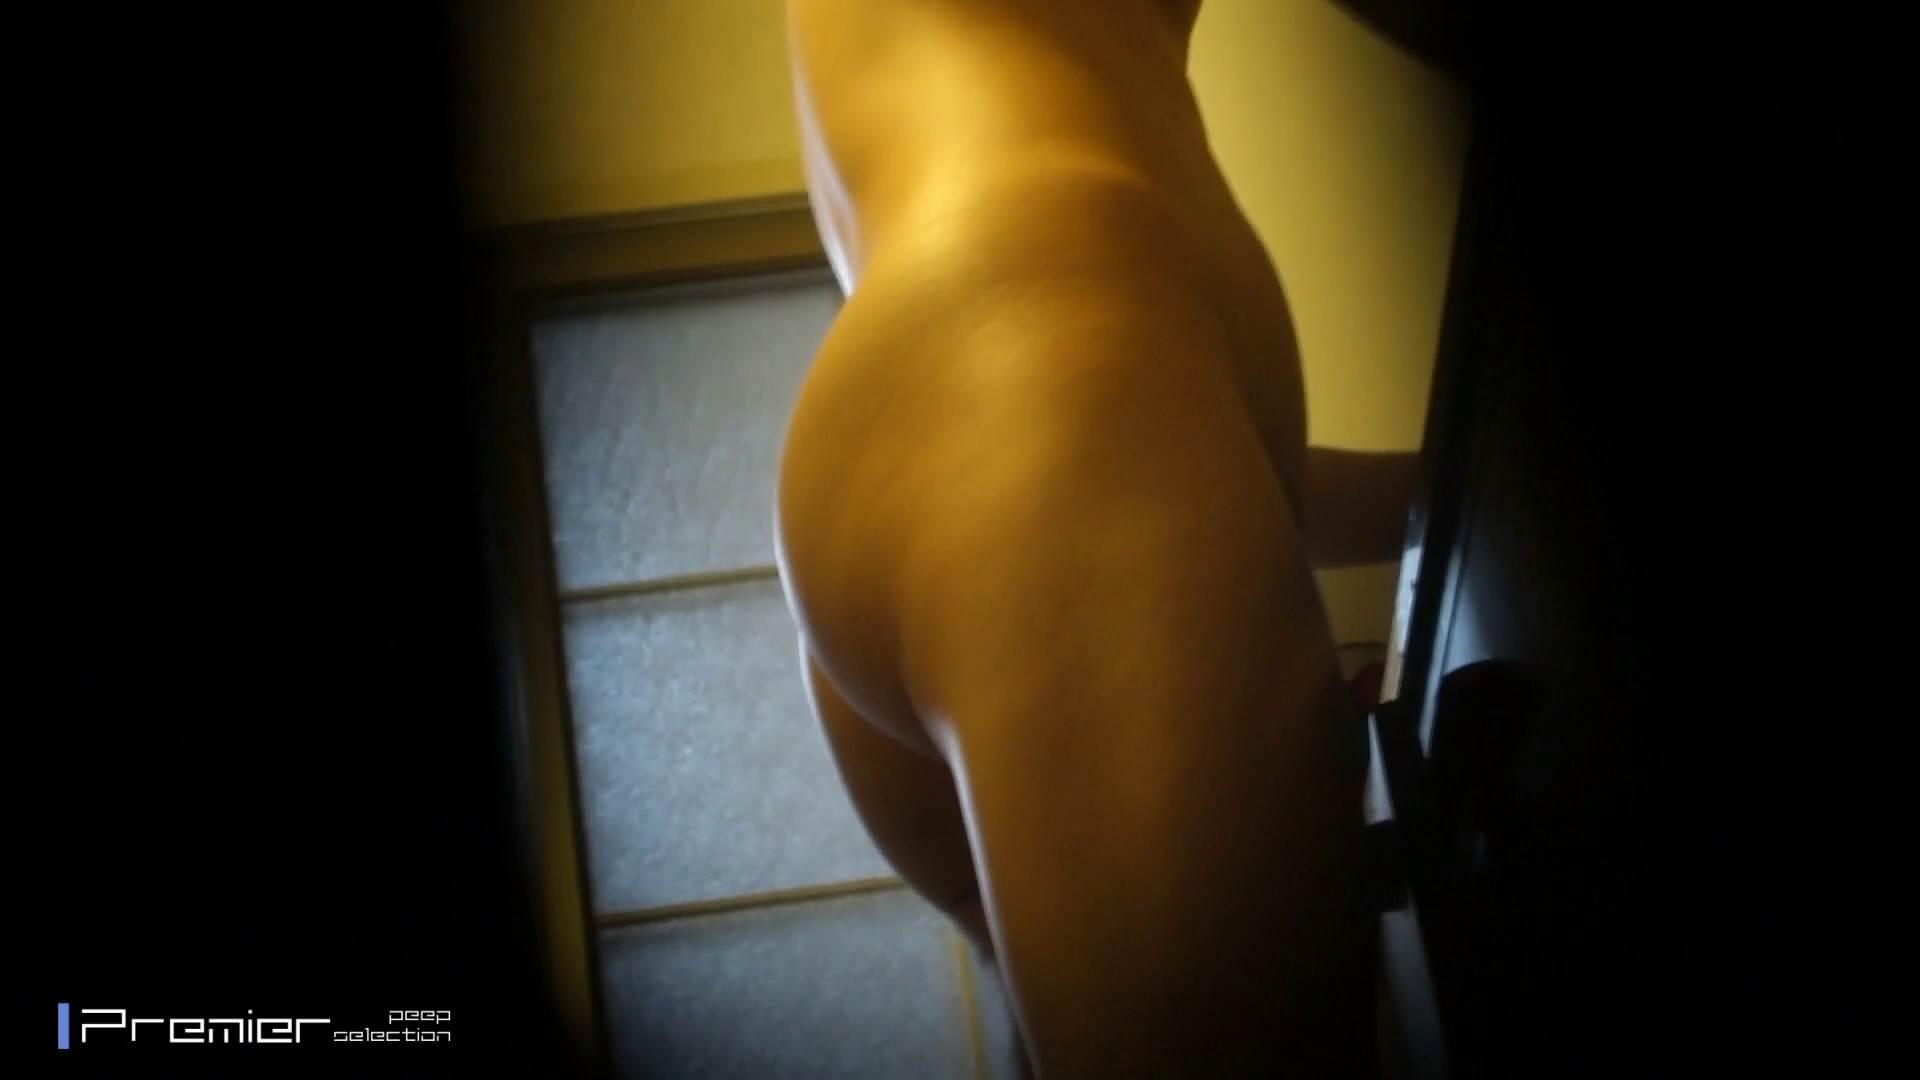 美人限定★女子大生の私生活★詰合せ 美女達の私生活に潜入! 細身体型 SEX無修正画像 103枚 34